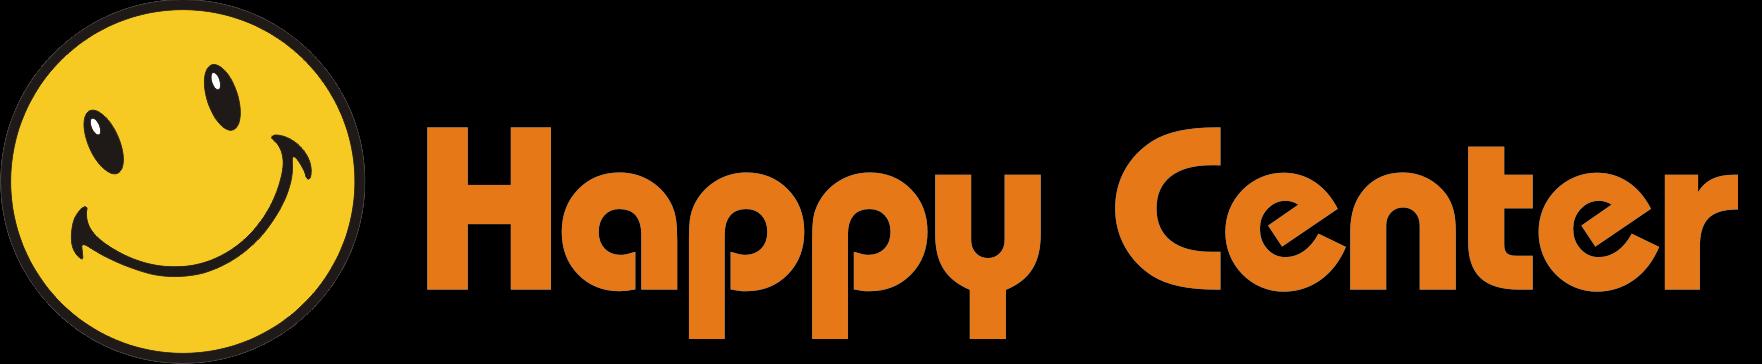 Happy Center Logolar